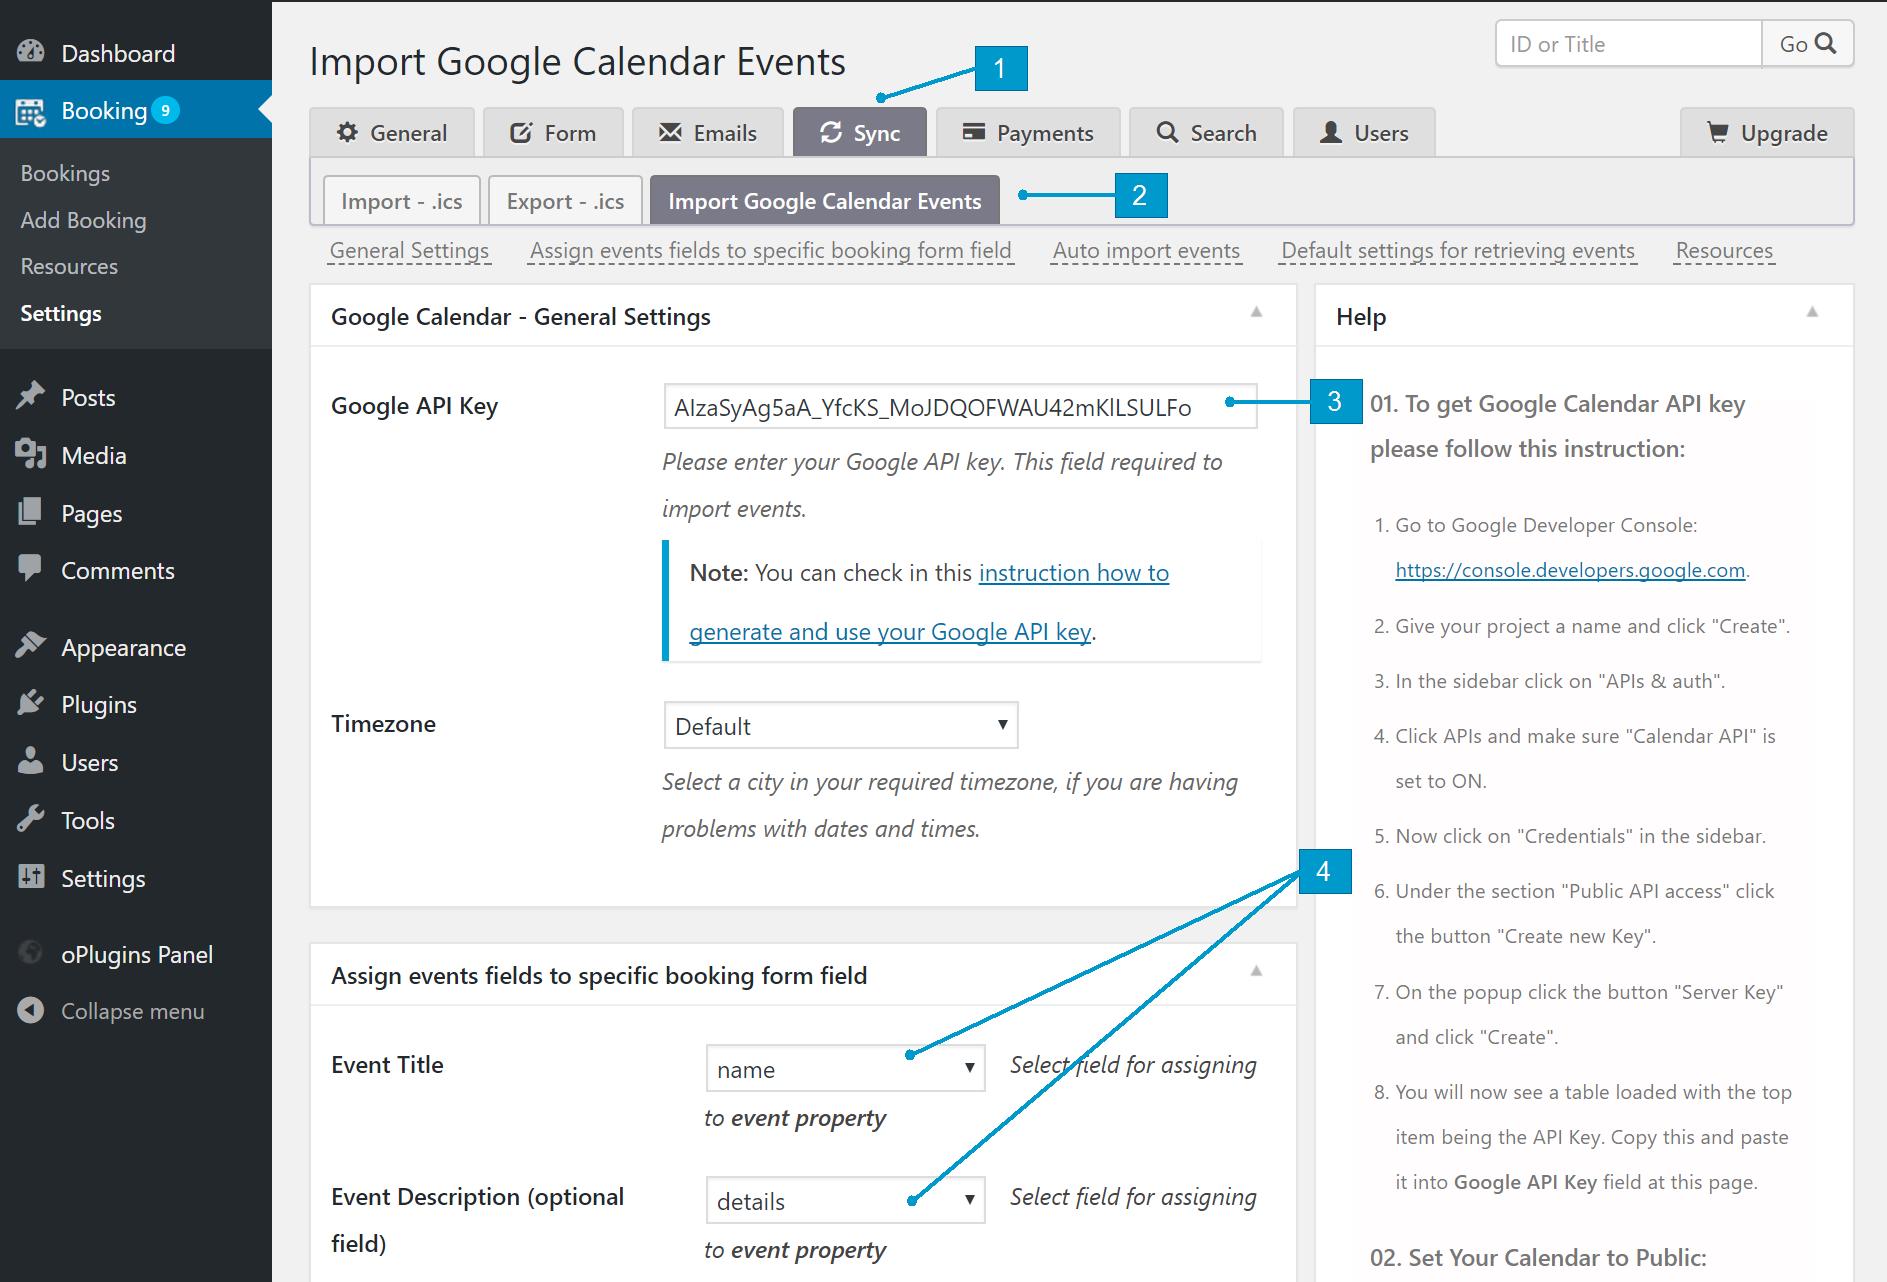 Configuration import events from public Google Calendar